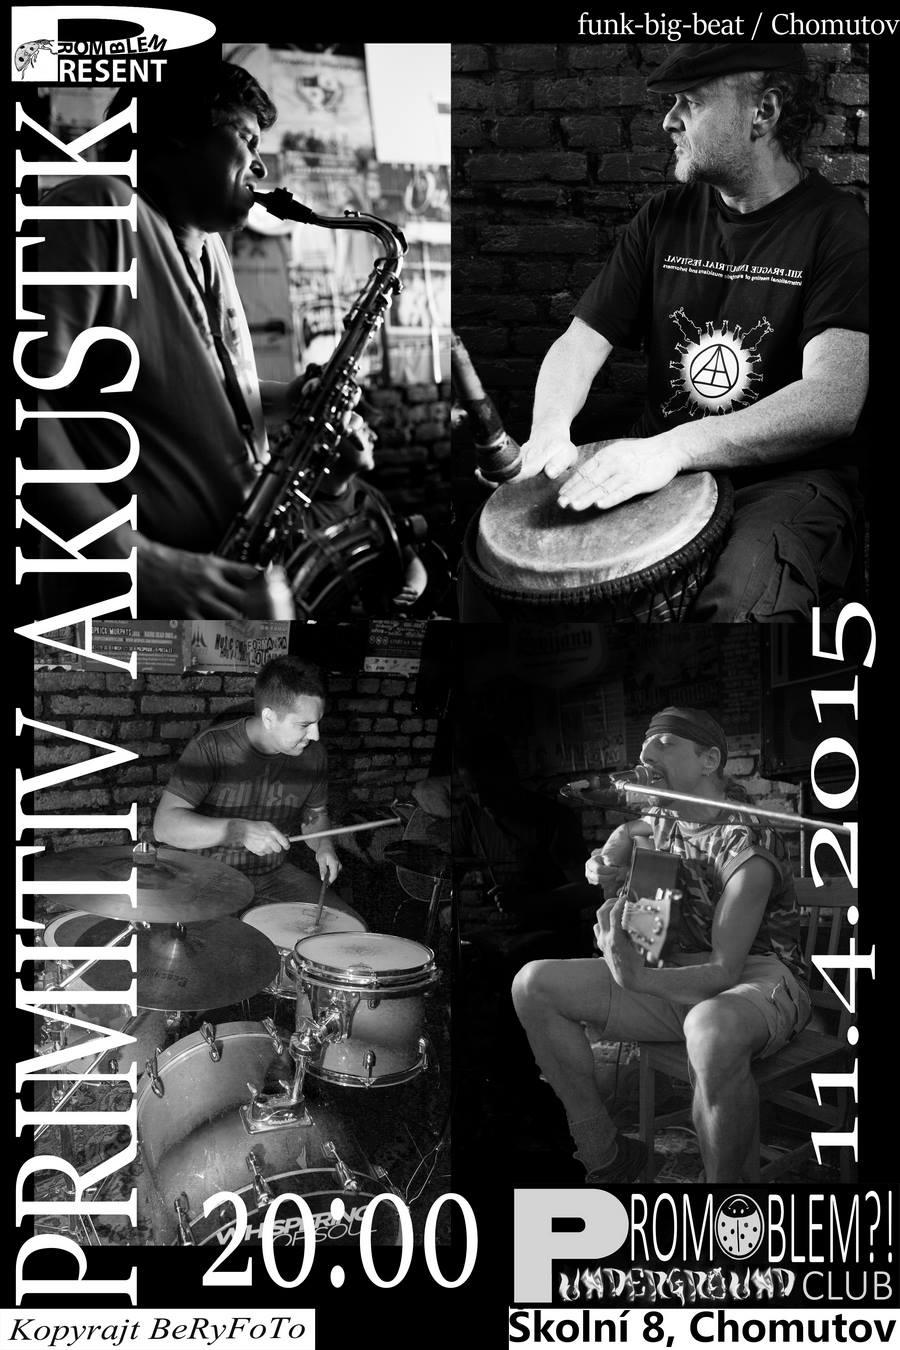 Pipes and pints feat majkelina cat karma killer - 5 6